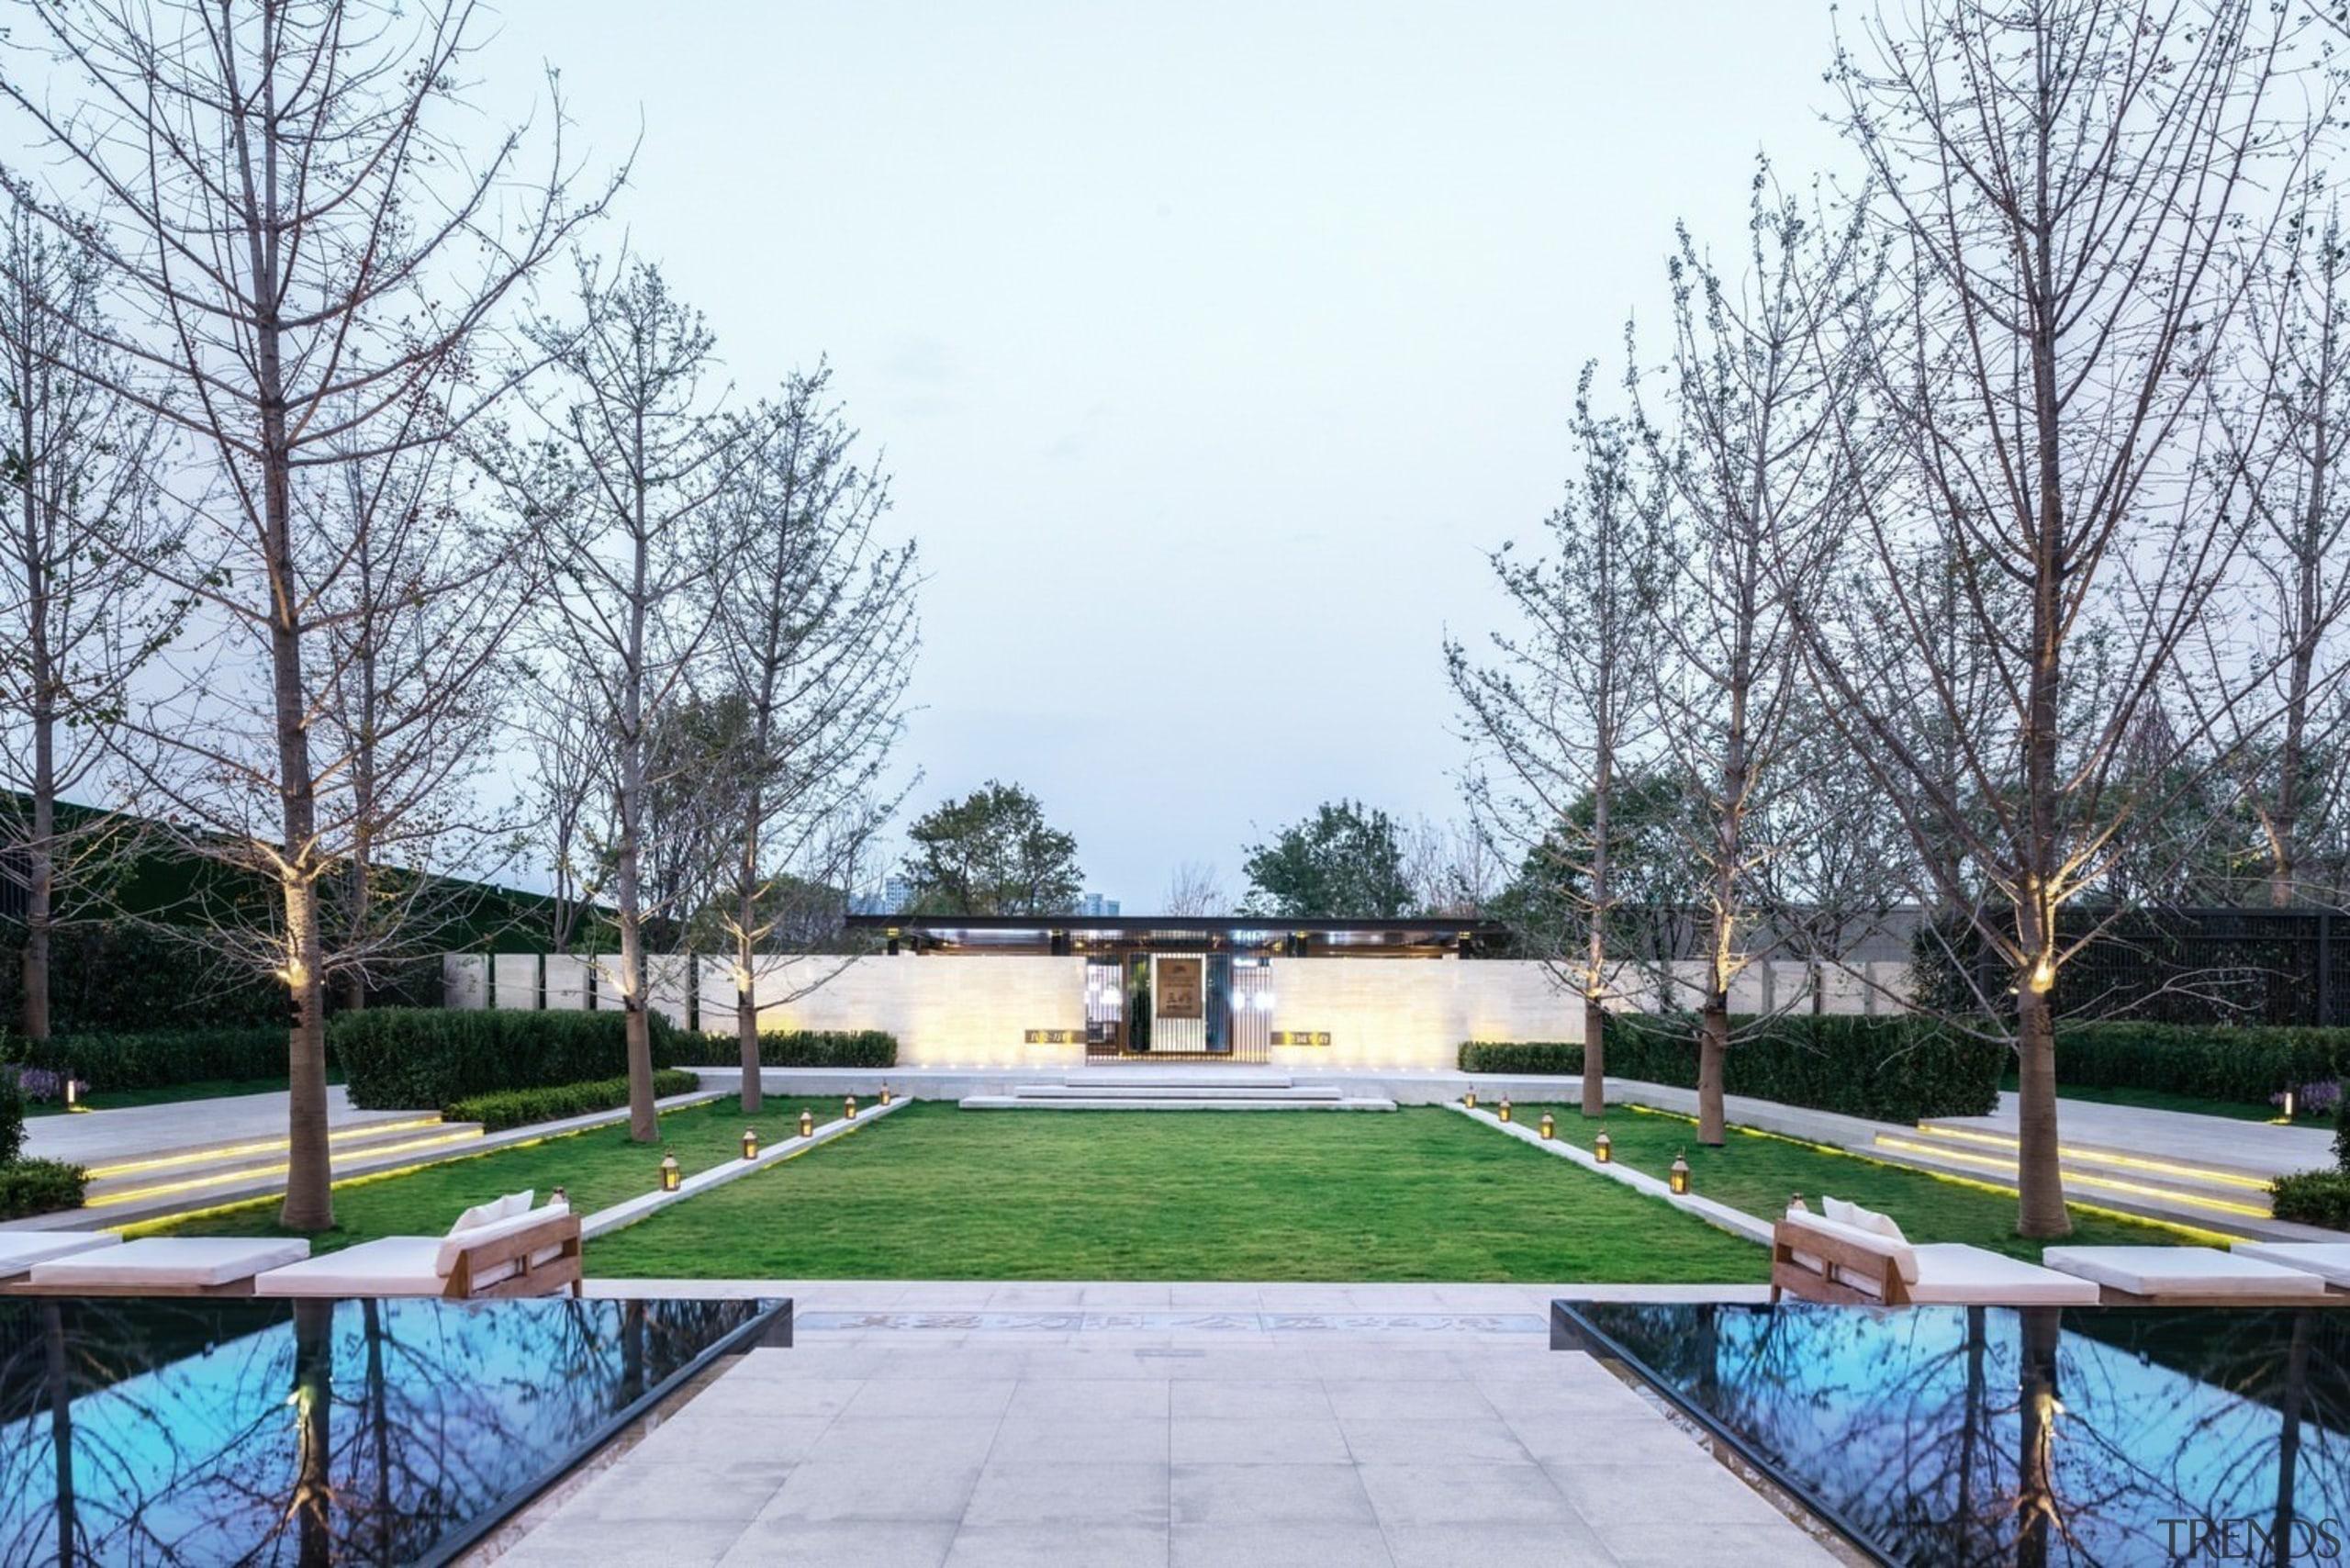 Vanke Park Mansion 'True Love' – FLOscape Landscape architecture, estate, garden, leisure, outdoor structure, park, plant, property, real estate, residential area, tree, white, gray